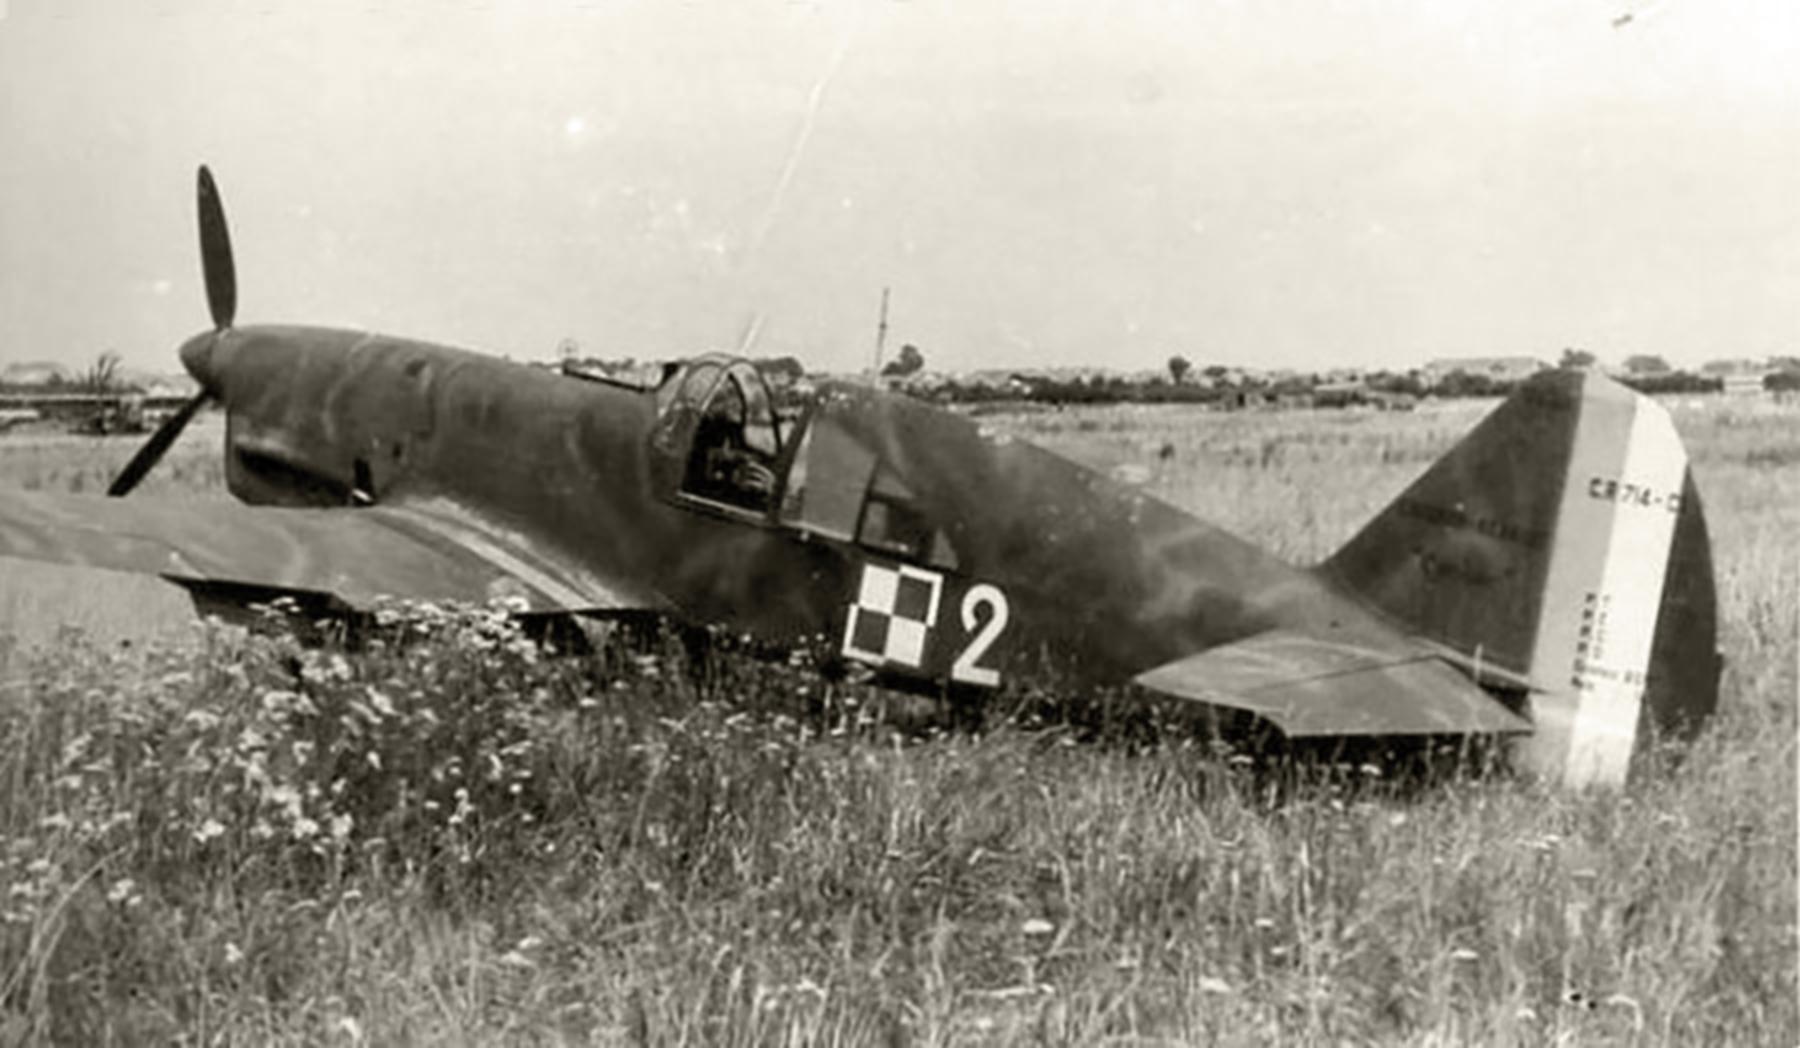 French Caudron CR 714C1 Cyclone White 2 Polish AF France 1940 web 01